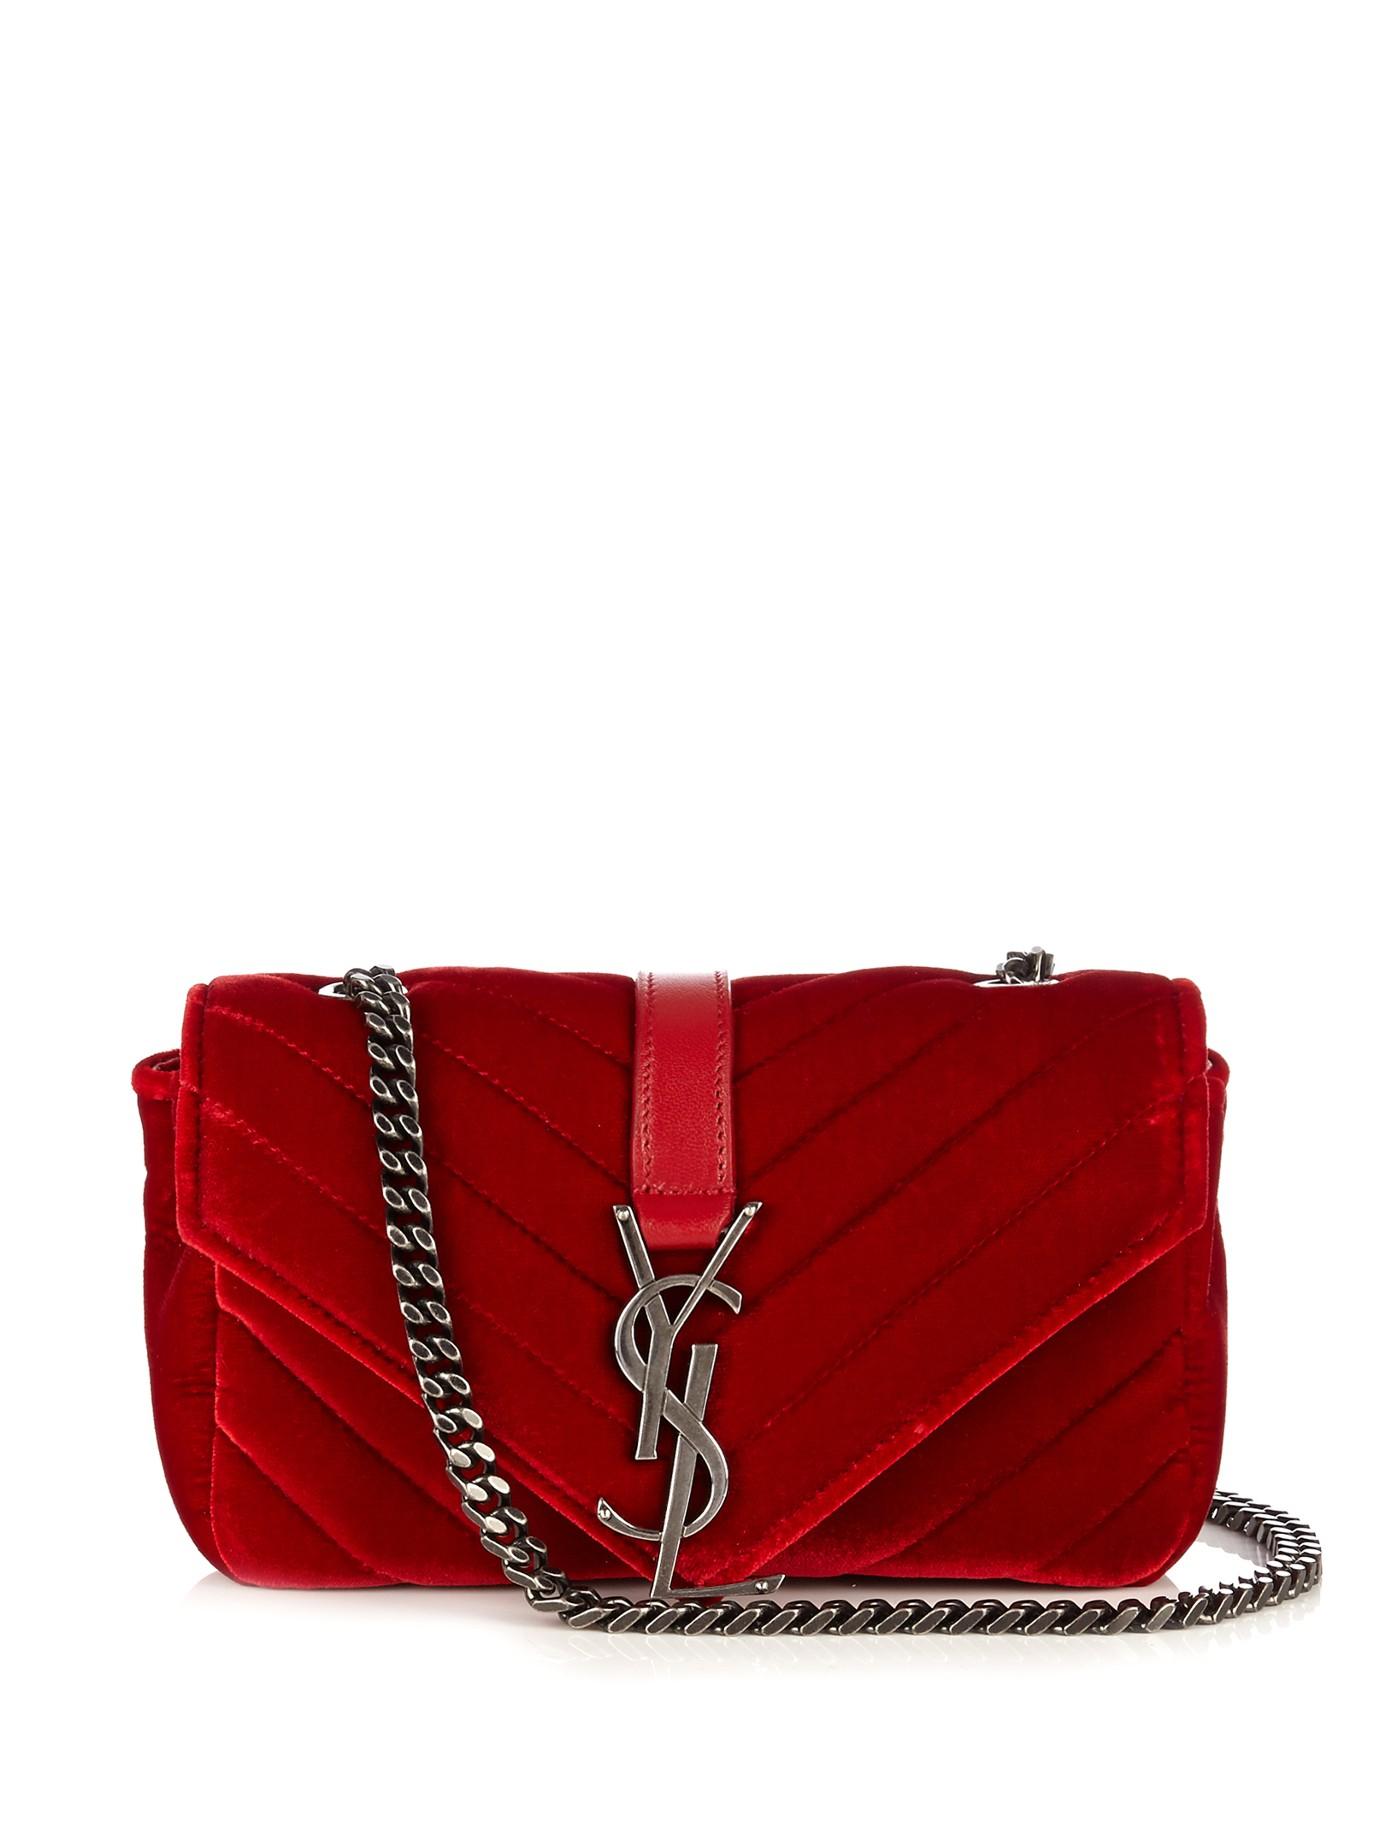 fc2638636a70 Lyst - Saint Laurent Monogram Baby Quilted-Velvet Crossbody Bag in Red